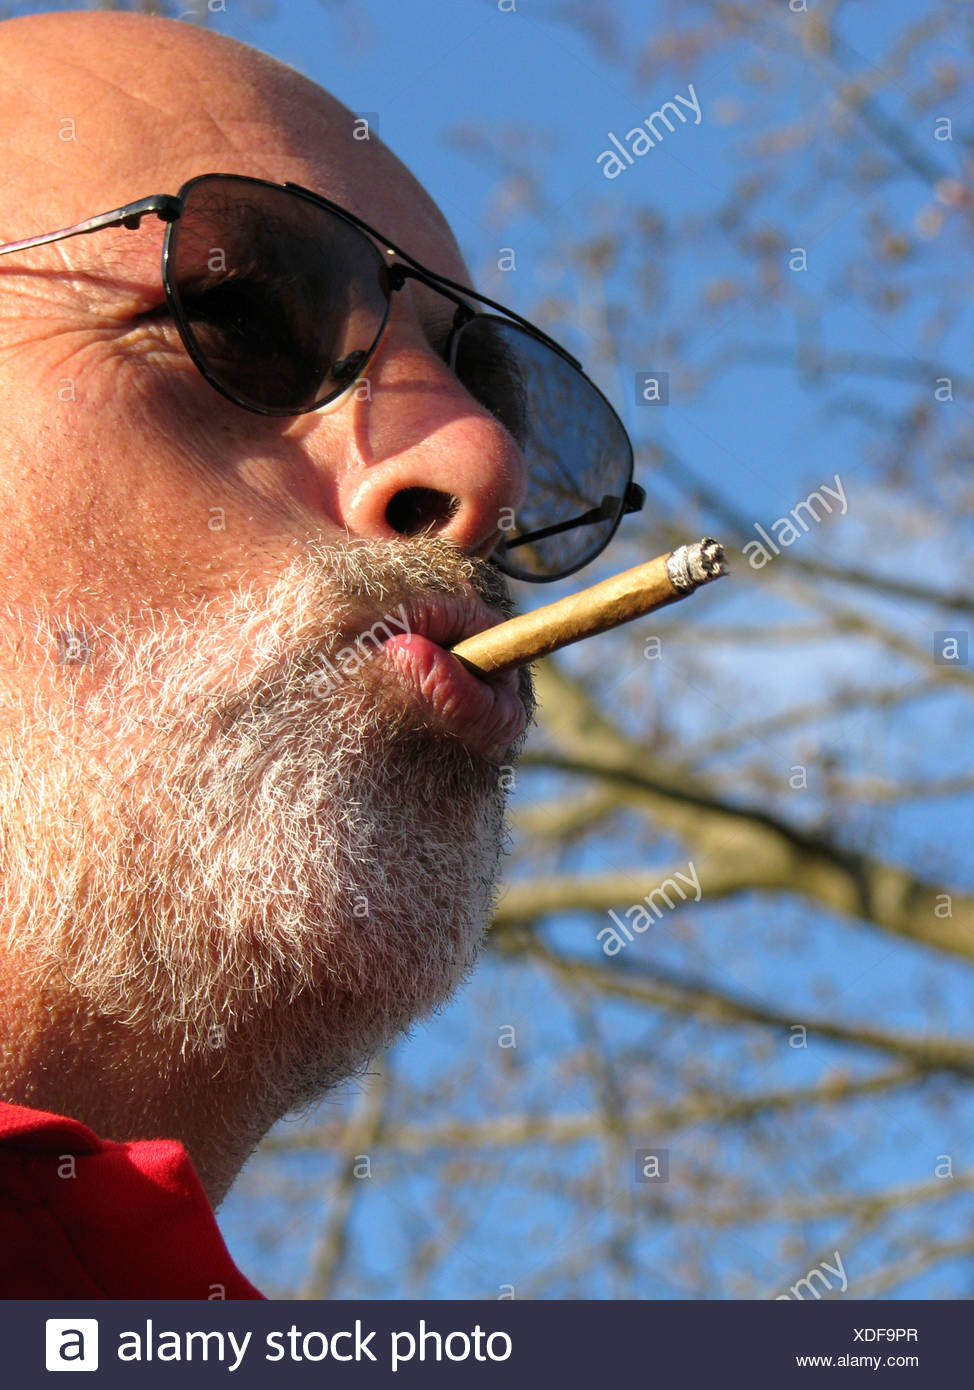 bearded man with sunglasses smokes cigarillo, Germany - Stock Image